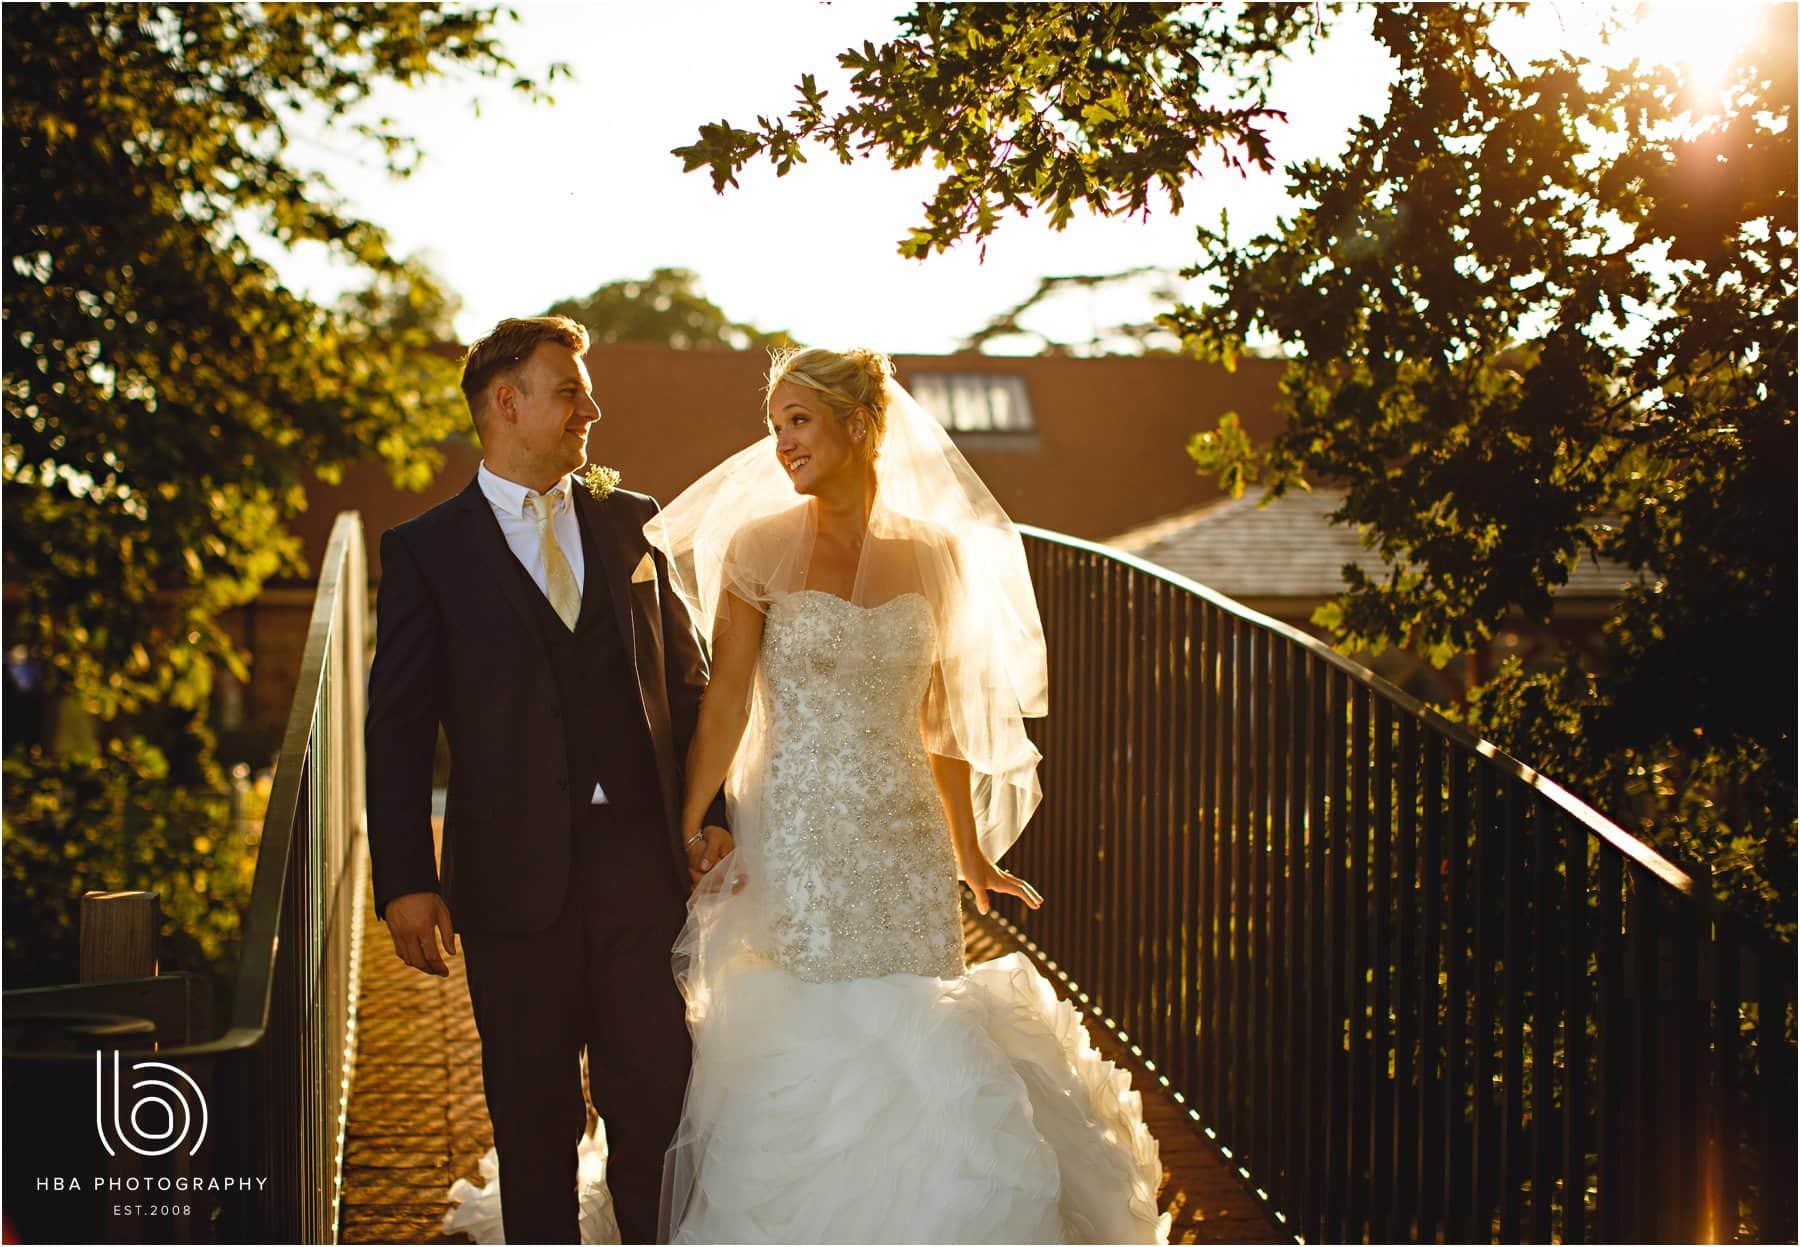 the bride & Groom walking on the bridge